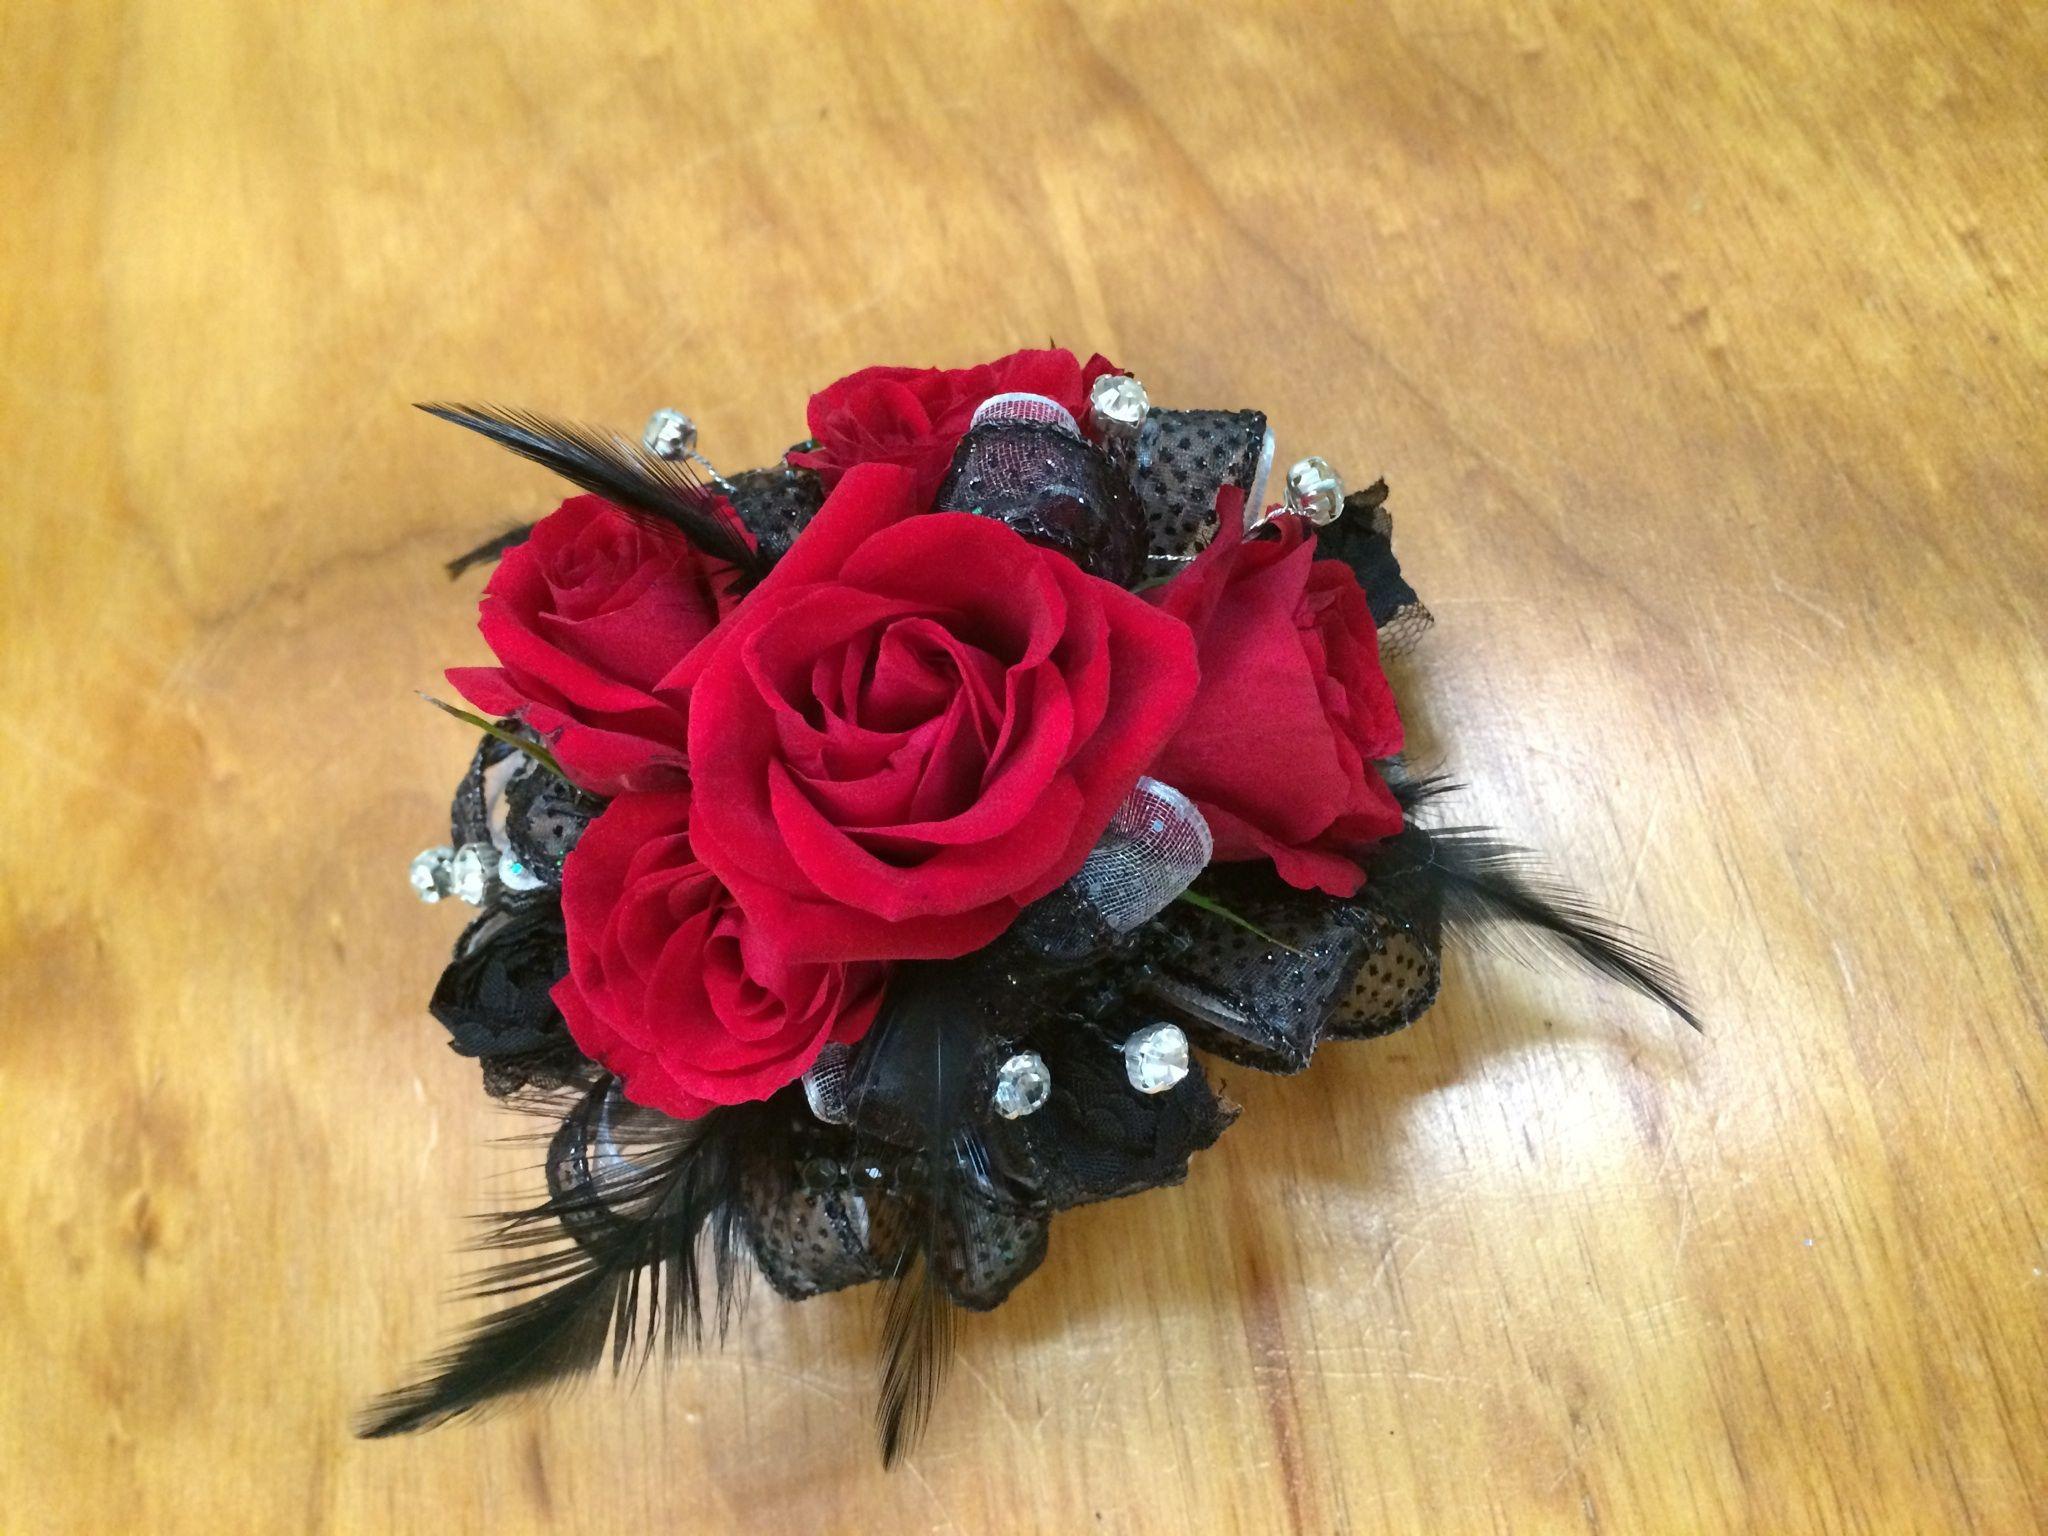 Klein High School Red Rose Wrist Corsage Spring Florist Flowers In